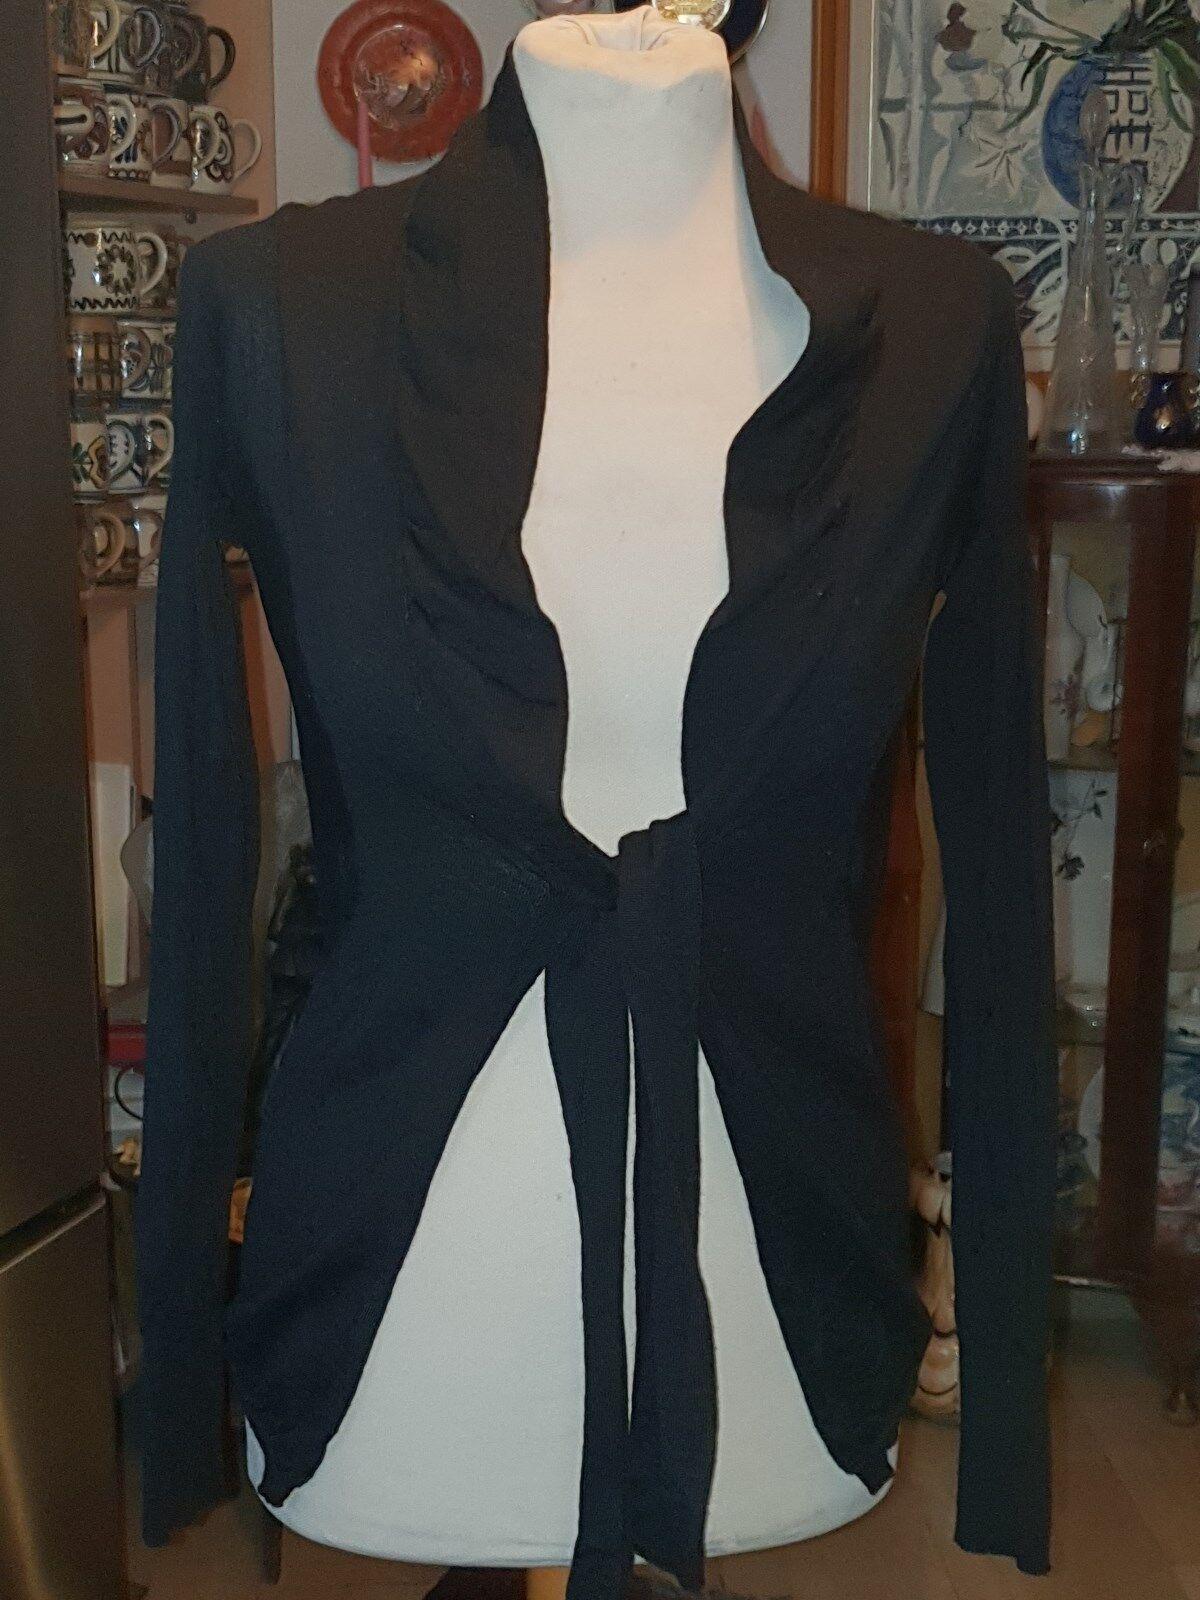 TRU TRUSSARDI  100% Lana Virgin Wool schwarz Top Cardigan Größe S   M